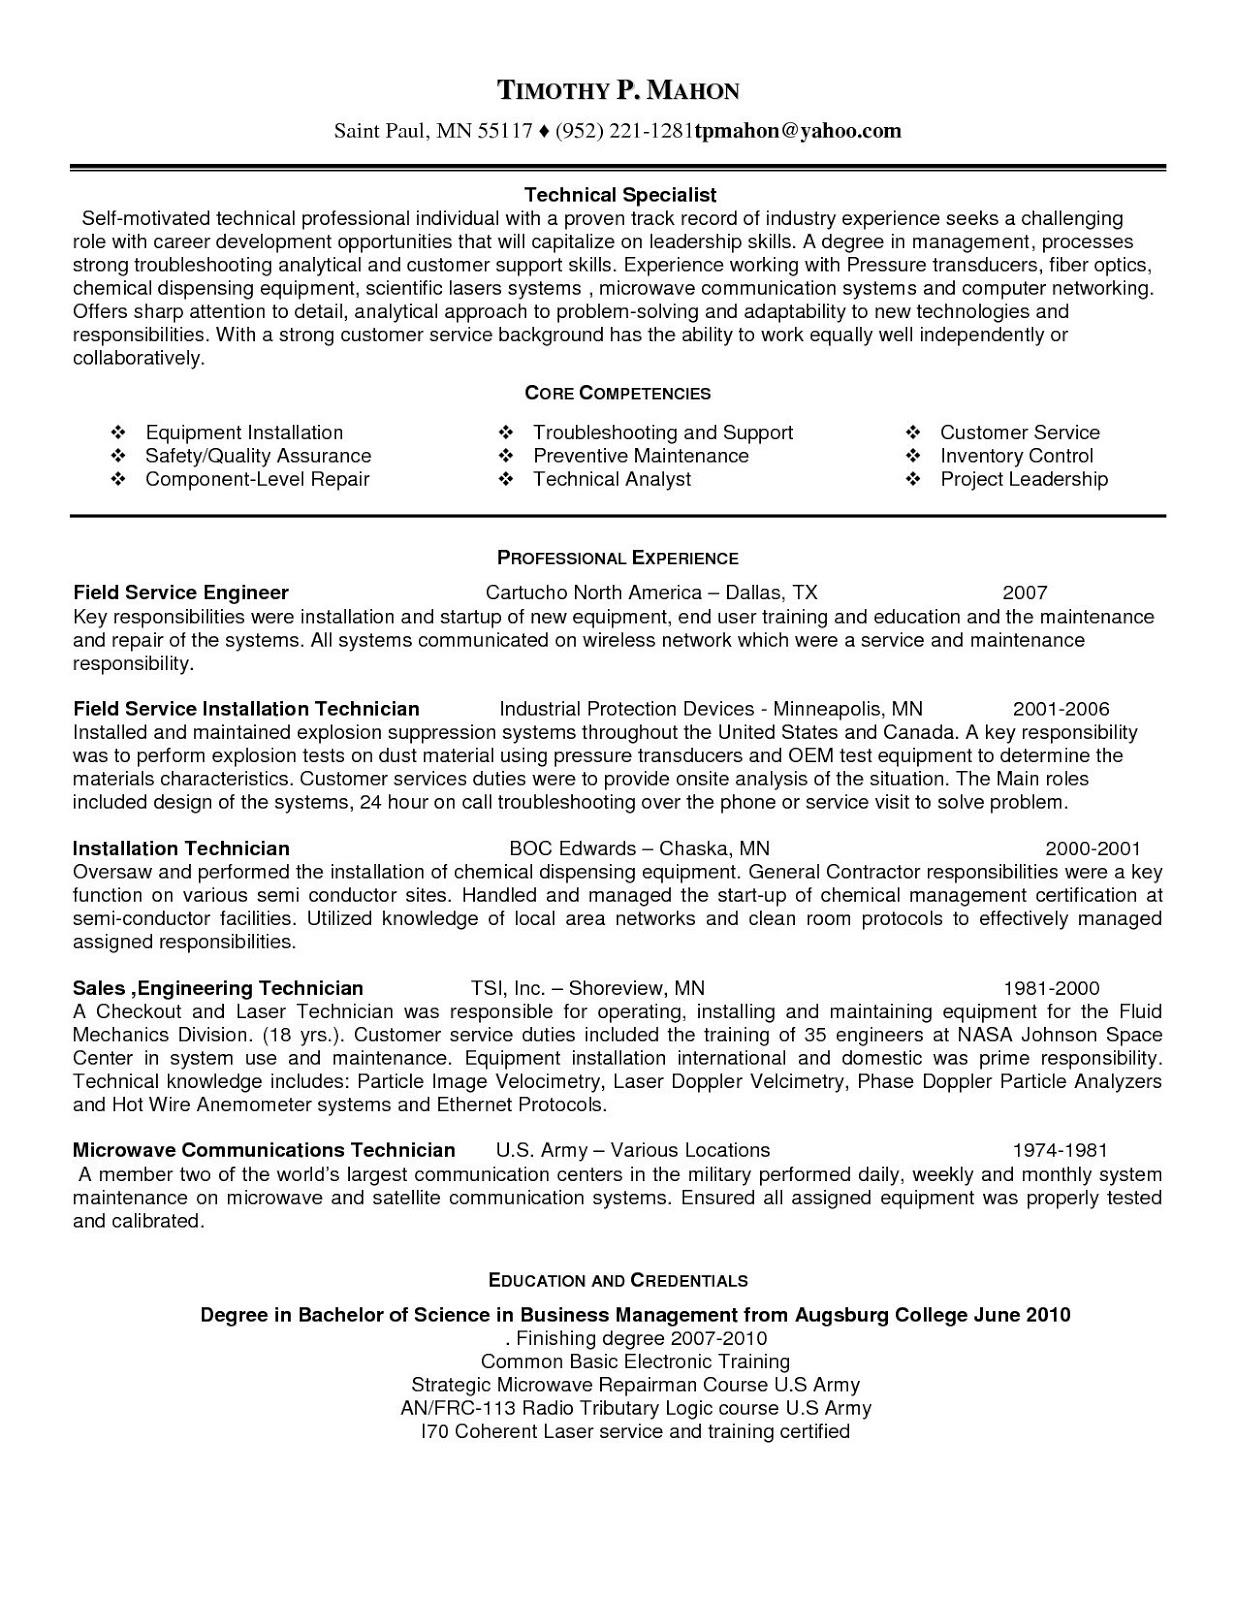 Maintenance Man Resume Sample 2019 Maintenance Man Resume Objective 2020 maintenance man resume objective maintenance man resume example apartment maintenance man resume maintenance serviceman resume maintenance man job description resume resume for maintenance man